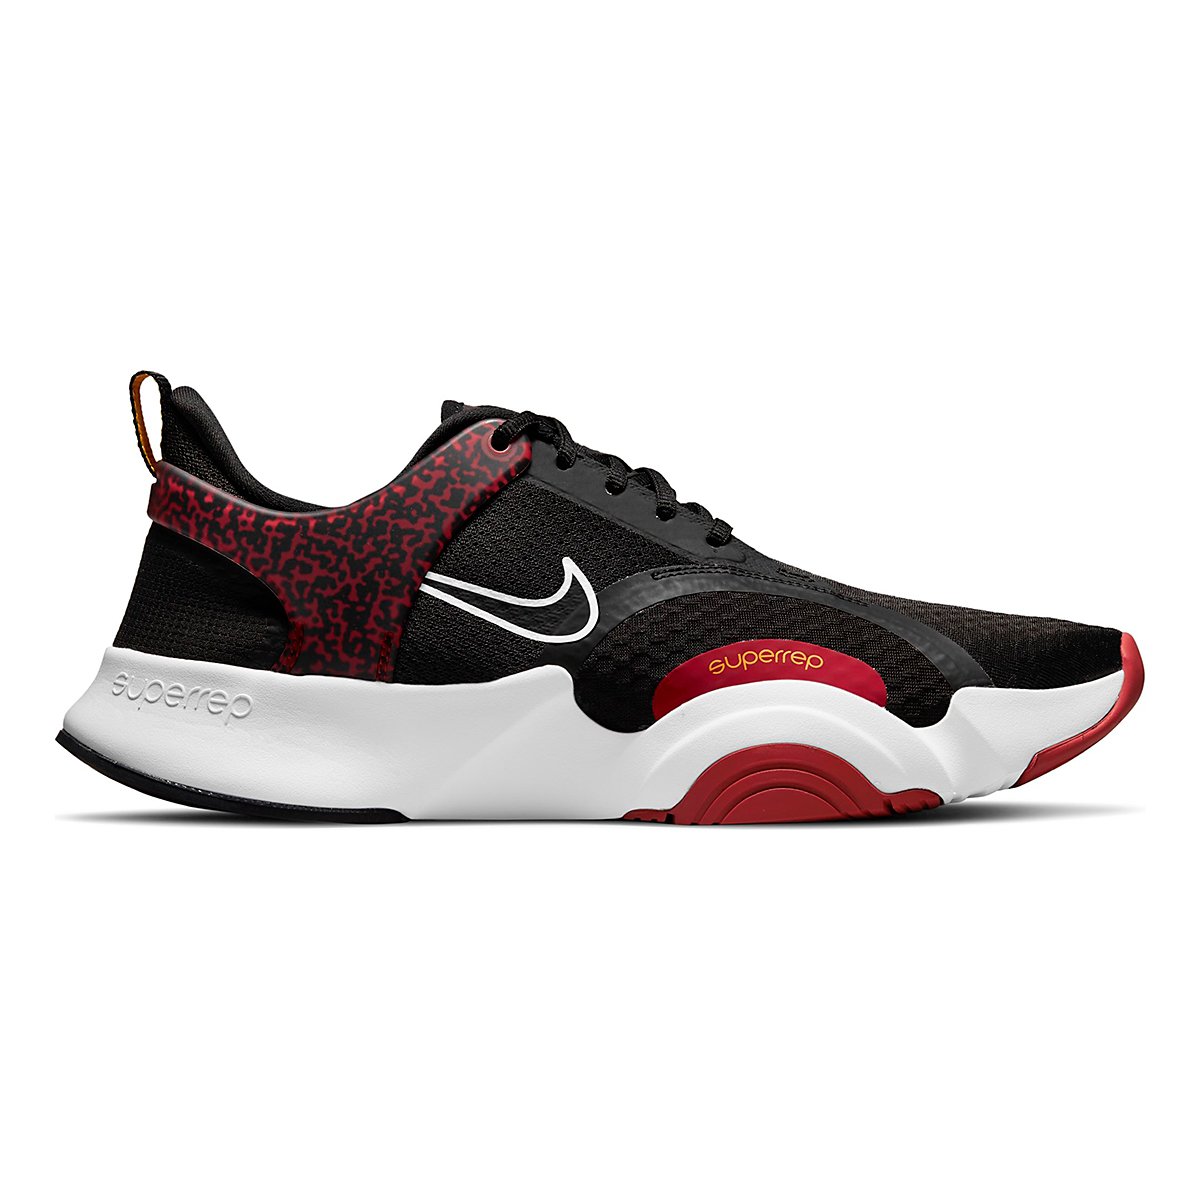 Men's Nike SuperRep Go 2 Training Shoe - Color: Black/White/Dark Cayenne/Solar Flare - Size: 6 - Width: Regular, Black/White/Dark Cayenne/Solar Flare, large, image 1